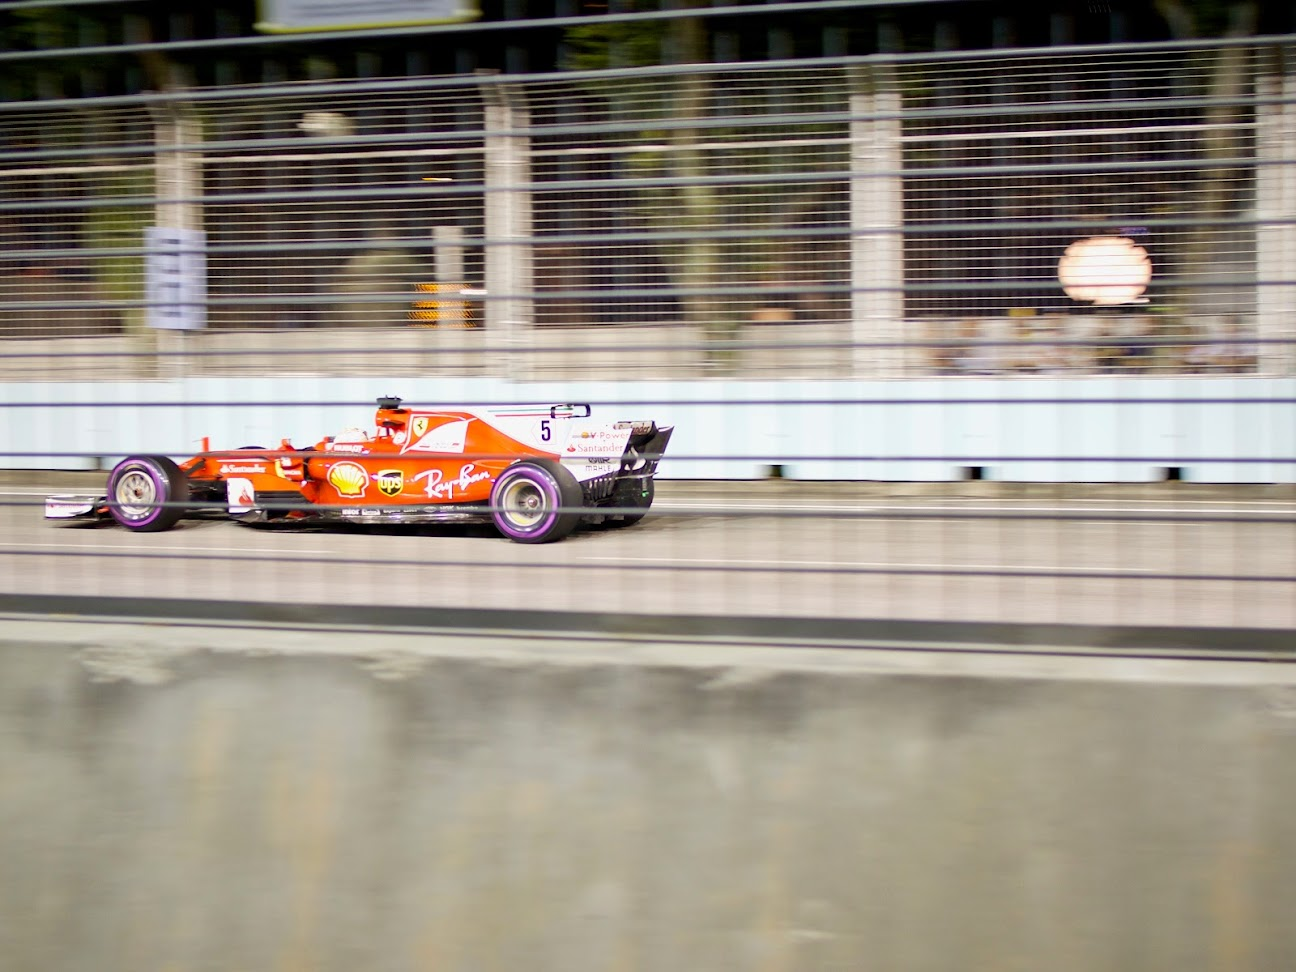 Singapore GP 2017 Qualifying